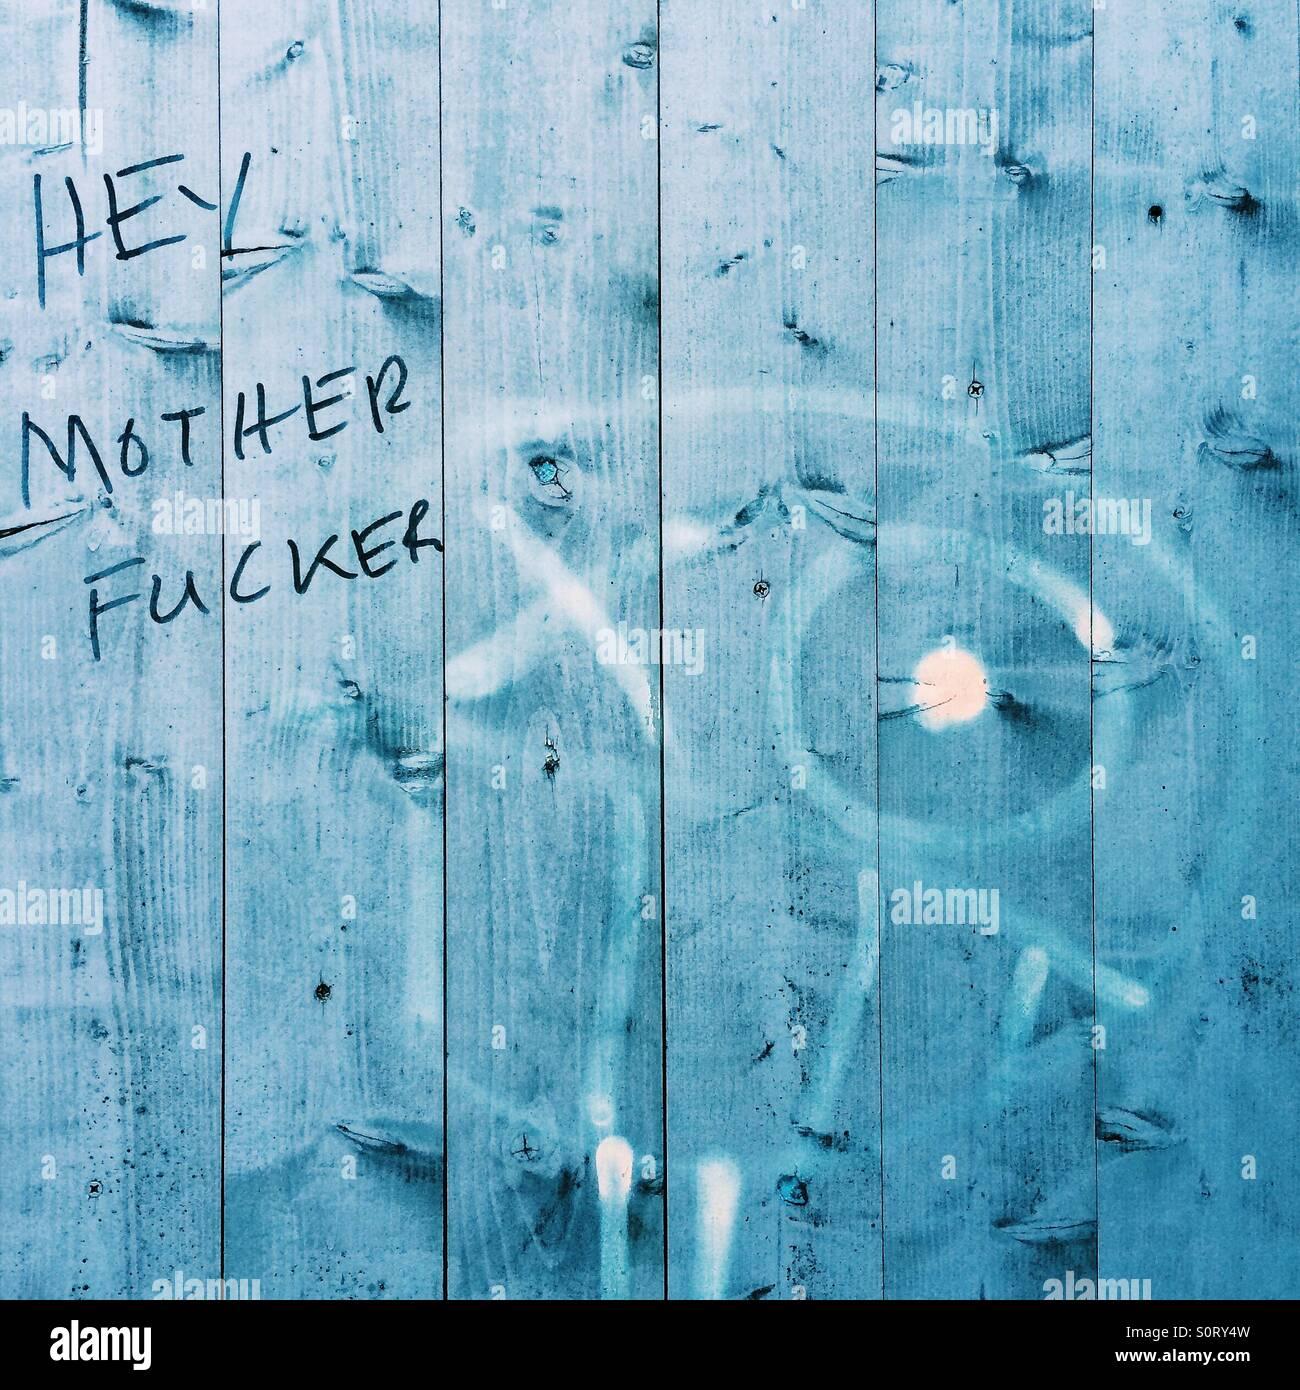 Colourful language graffiti on blue fence - Stock Image